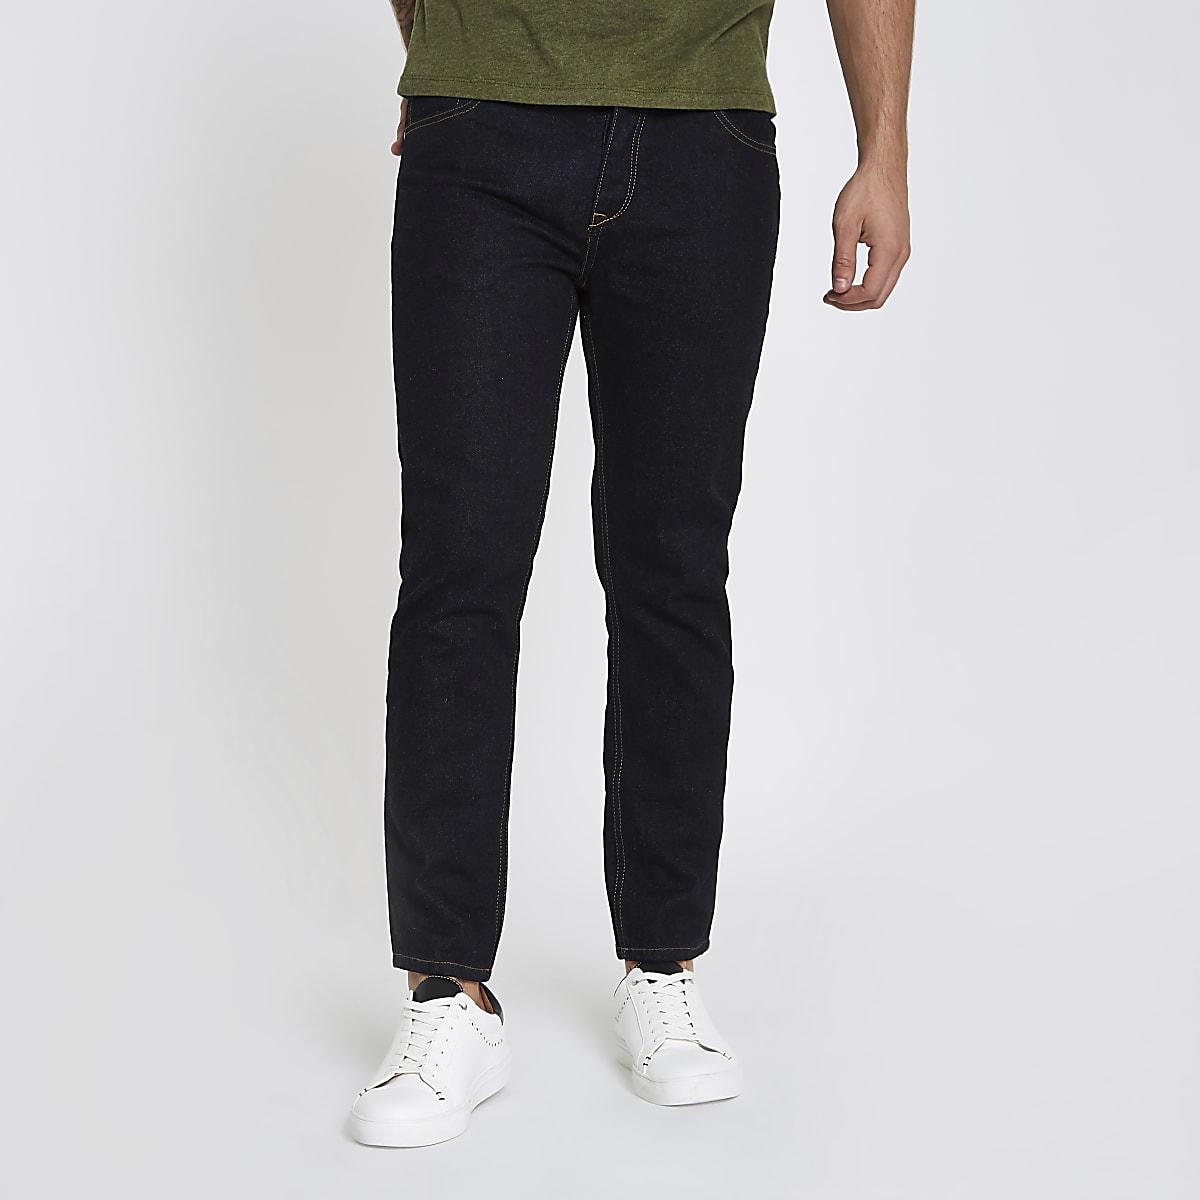 Jimmy - Donkerblauwe rinse smaltoelopende jeans